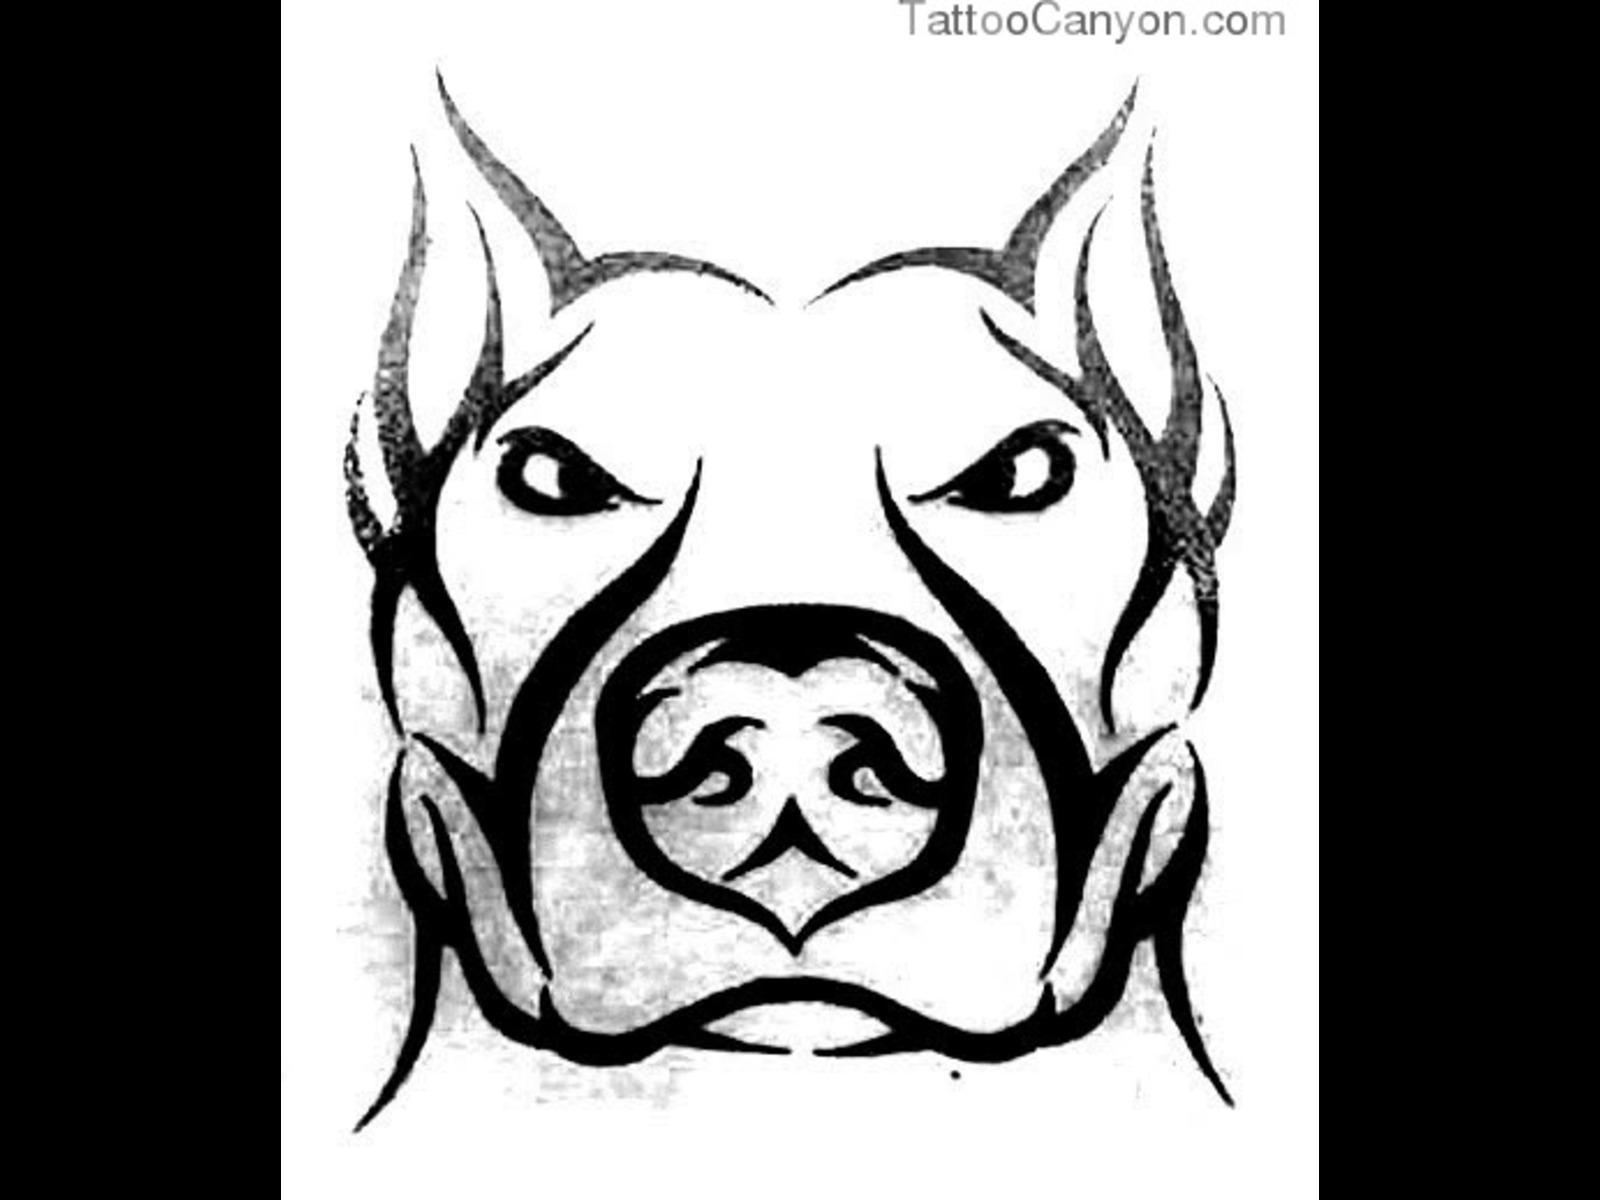 Drawn pitbull gangster Pitbull Nose Download of 1600x1200